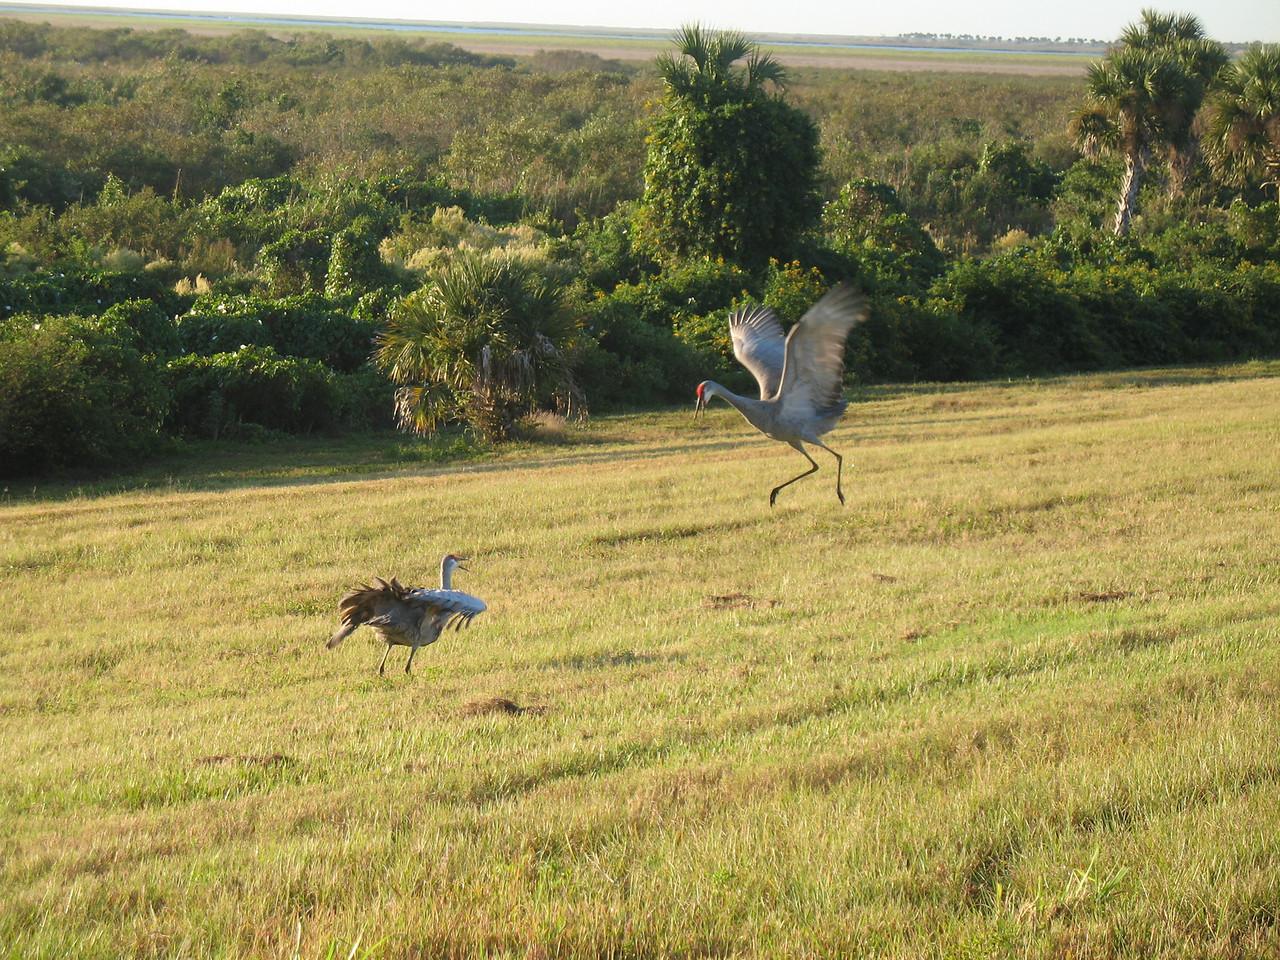 Sandhill cranes dance atop the dike at Okeechobee<br /> PHOTO CREDIT: Sandra Friend / Florida Trail Association